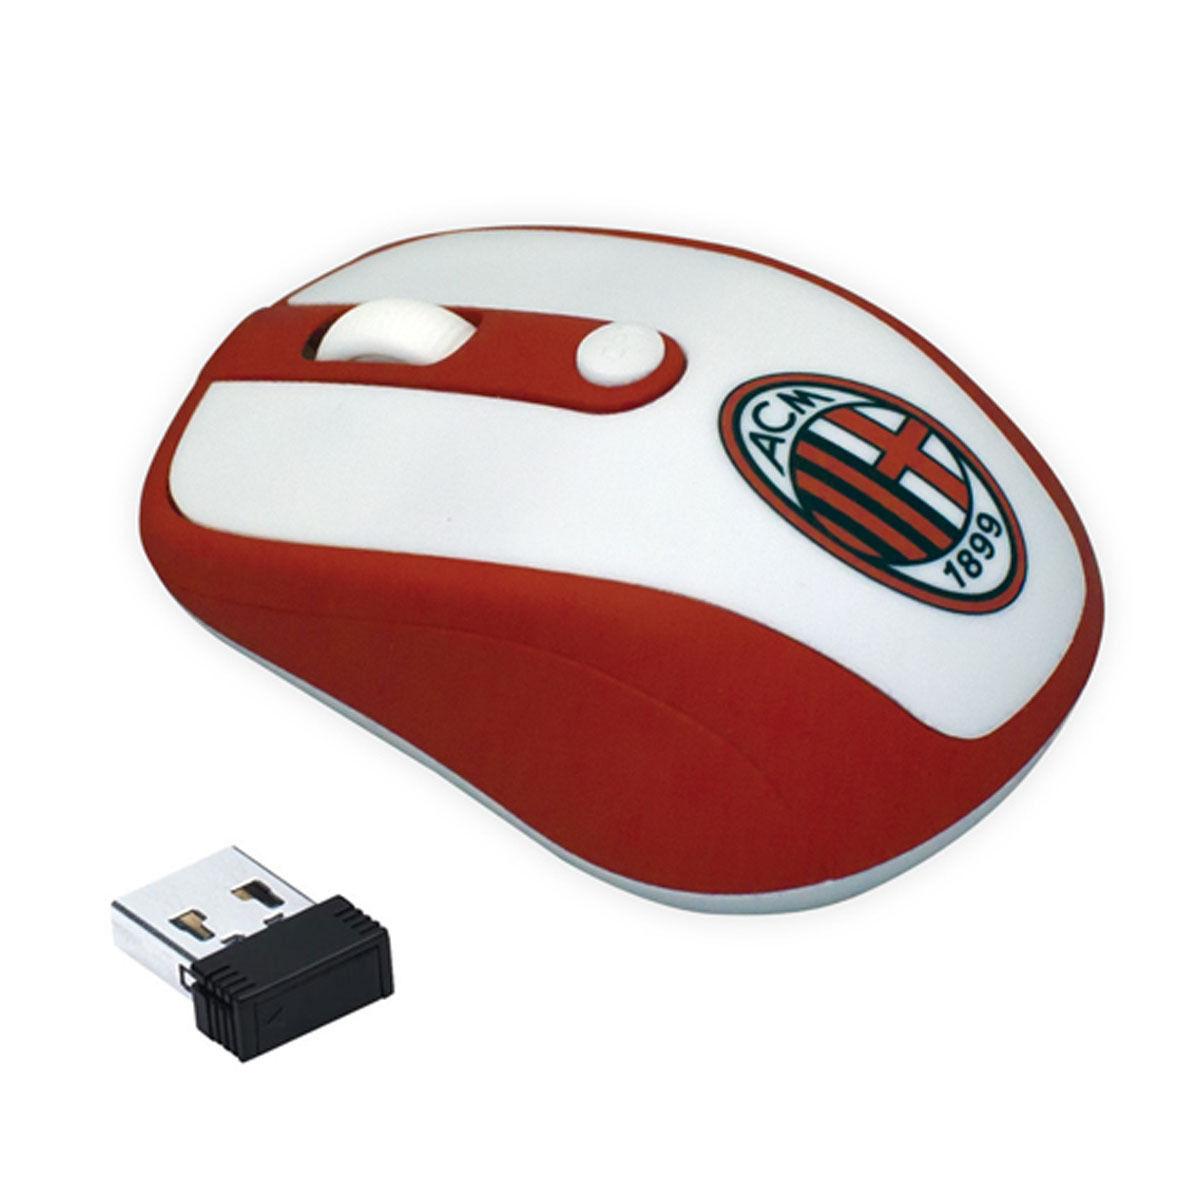 Mouse wireless Milan